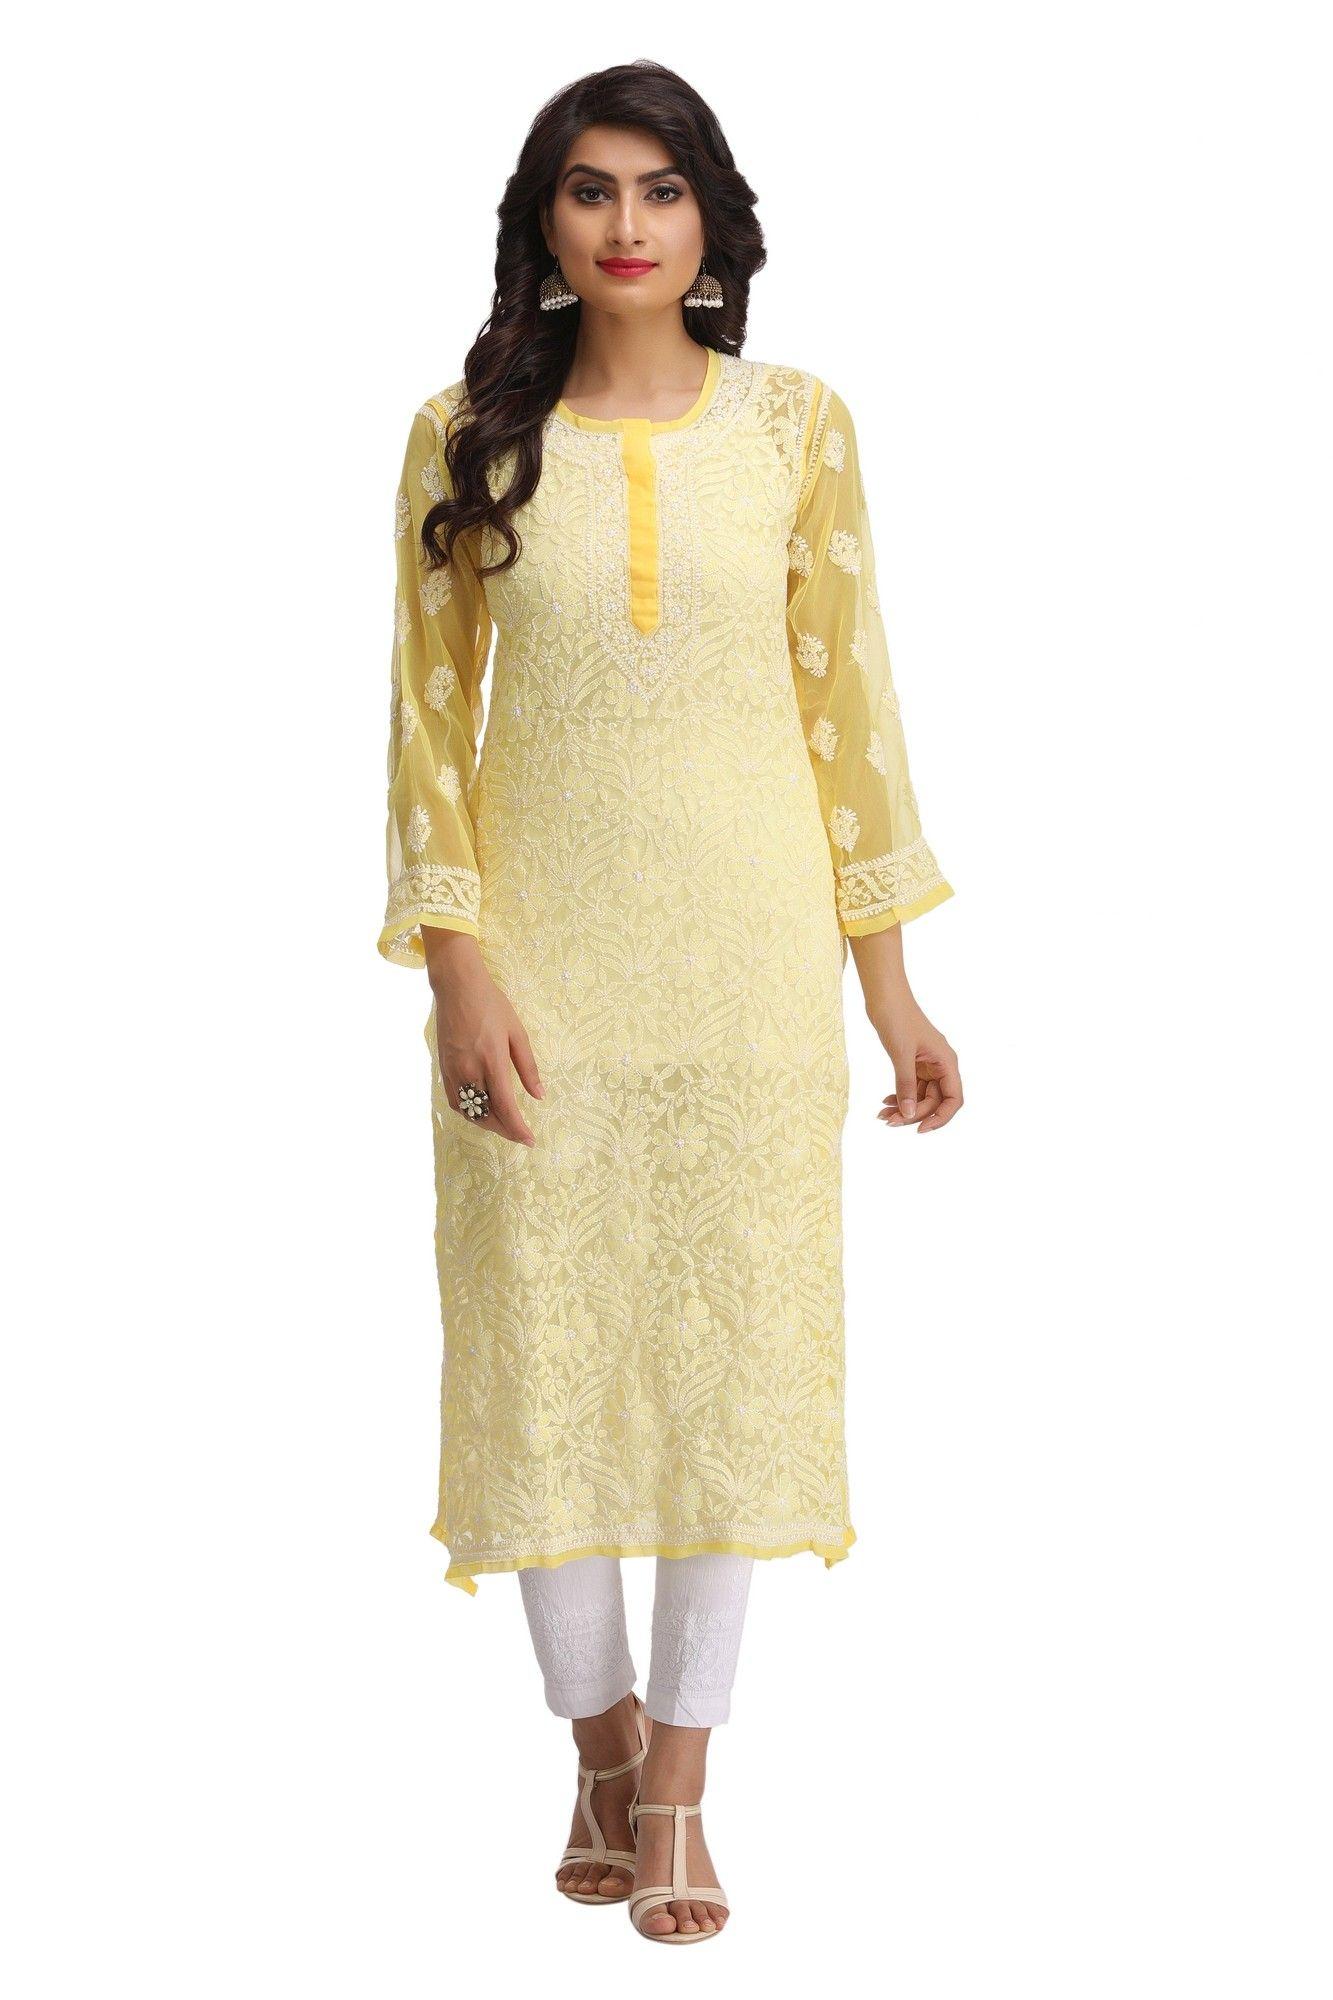 ad76d392a4d Ada Hand Embroidered Yellow Faux Georgette Lucknowi Chikankari Kurti -  A187448 - Chikan Kurtis - Women Chikan Wear